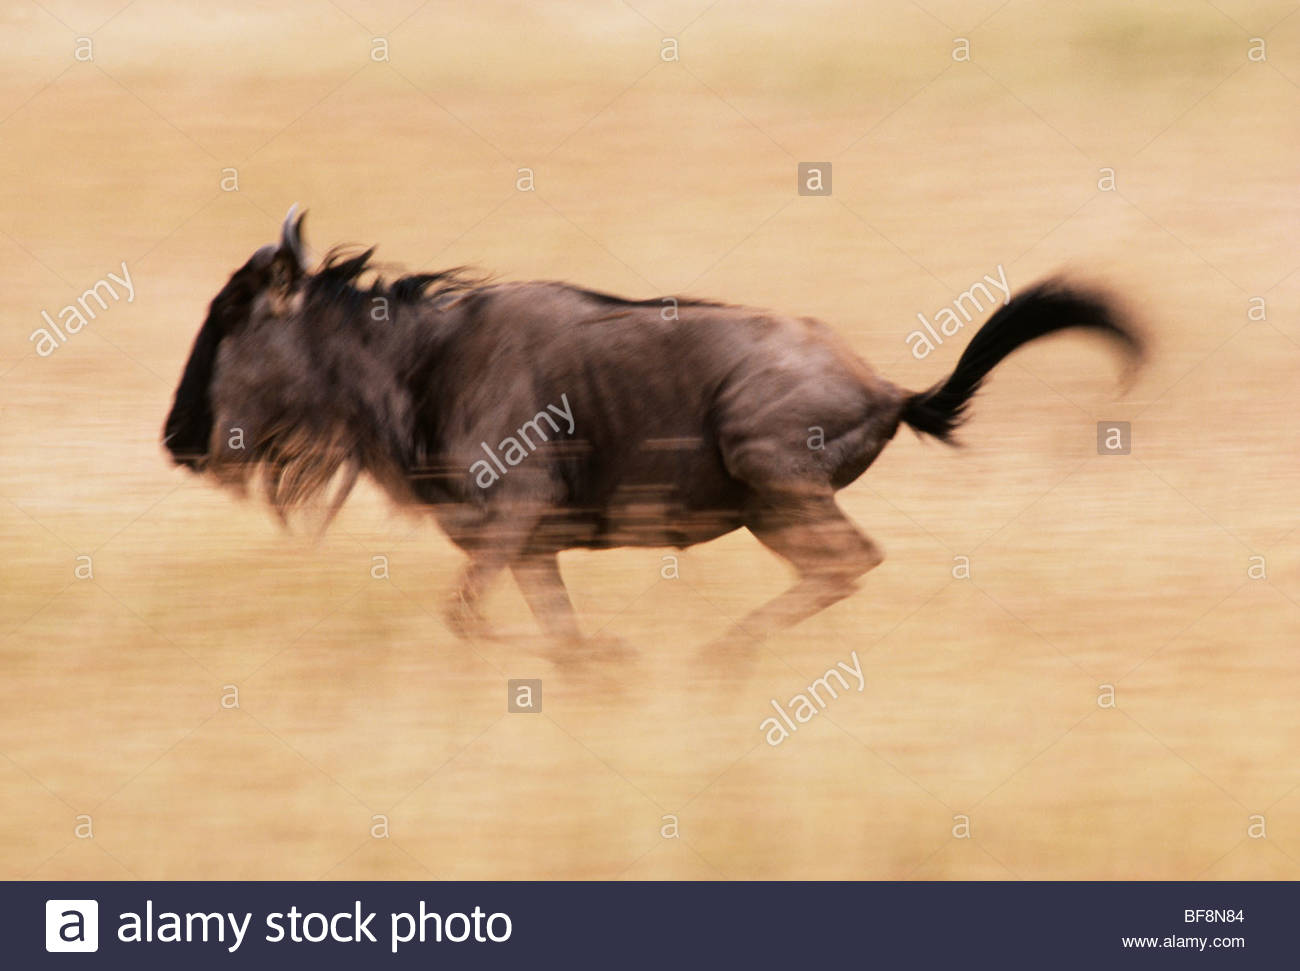 Blue wildebeest running, Connochaetes taurinus, Masai Mara Reserve, Kenya - Stock Image